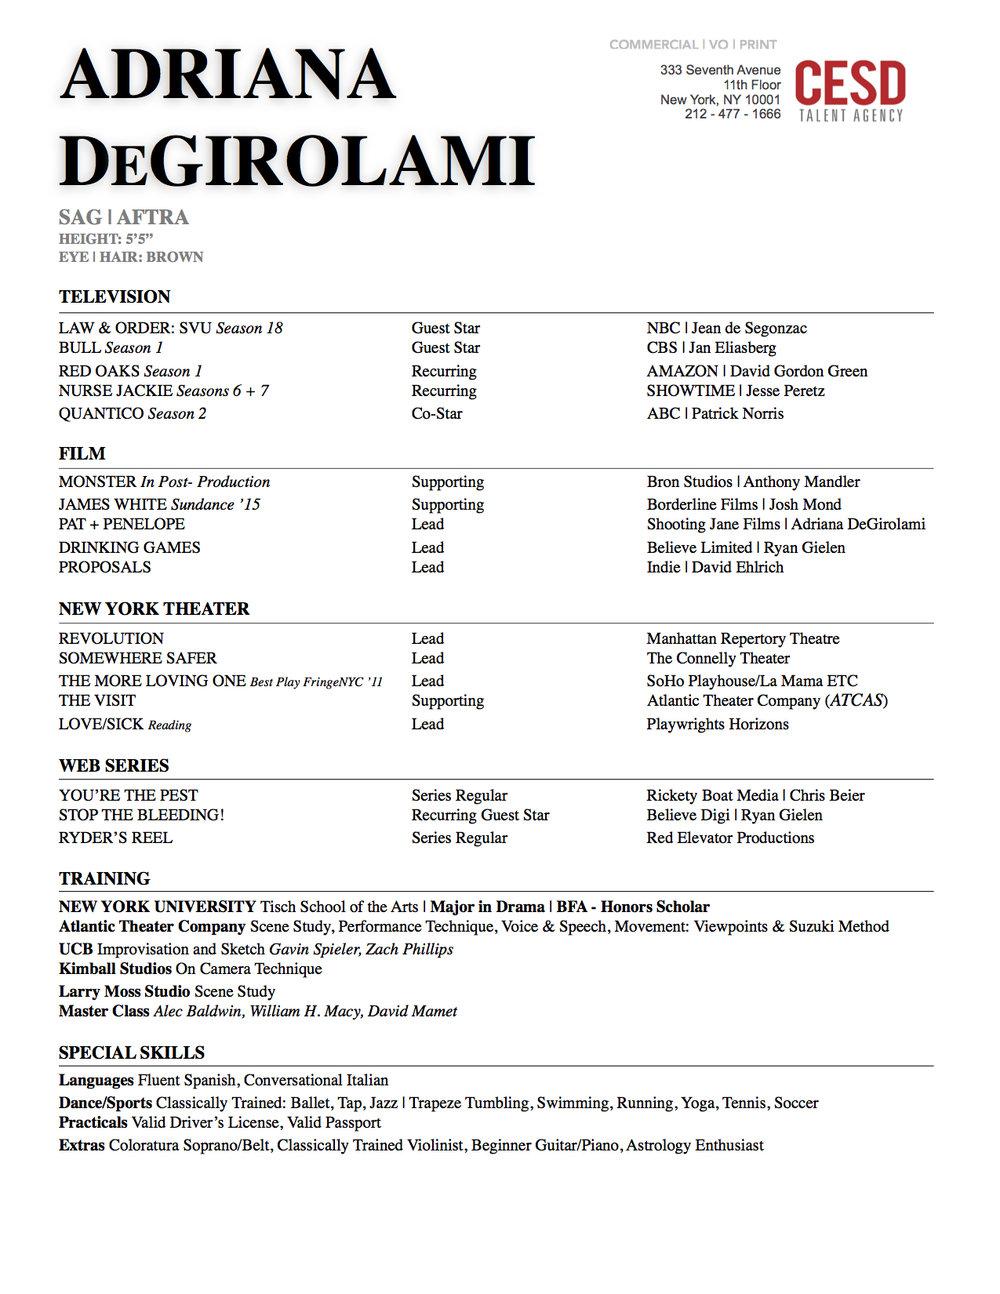 Adriana DeGirolami Resume JPG.jpg